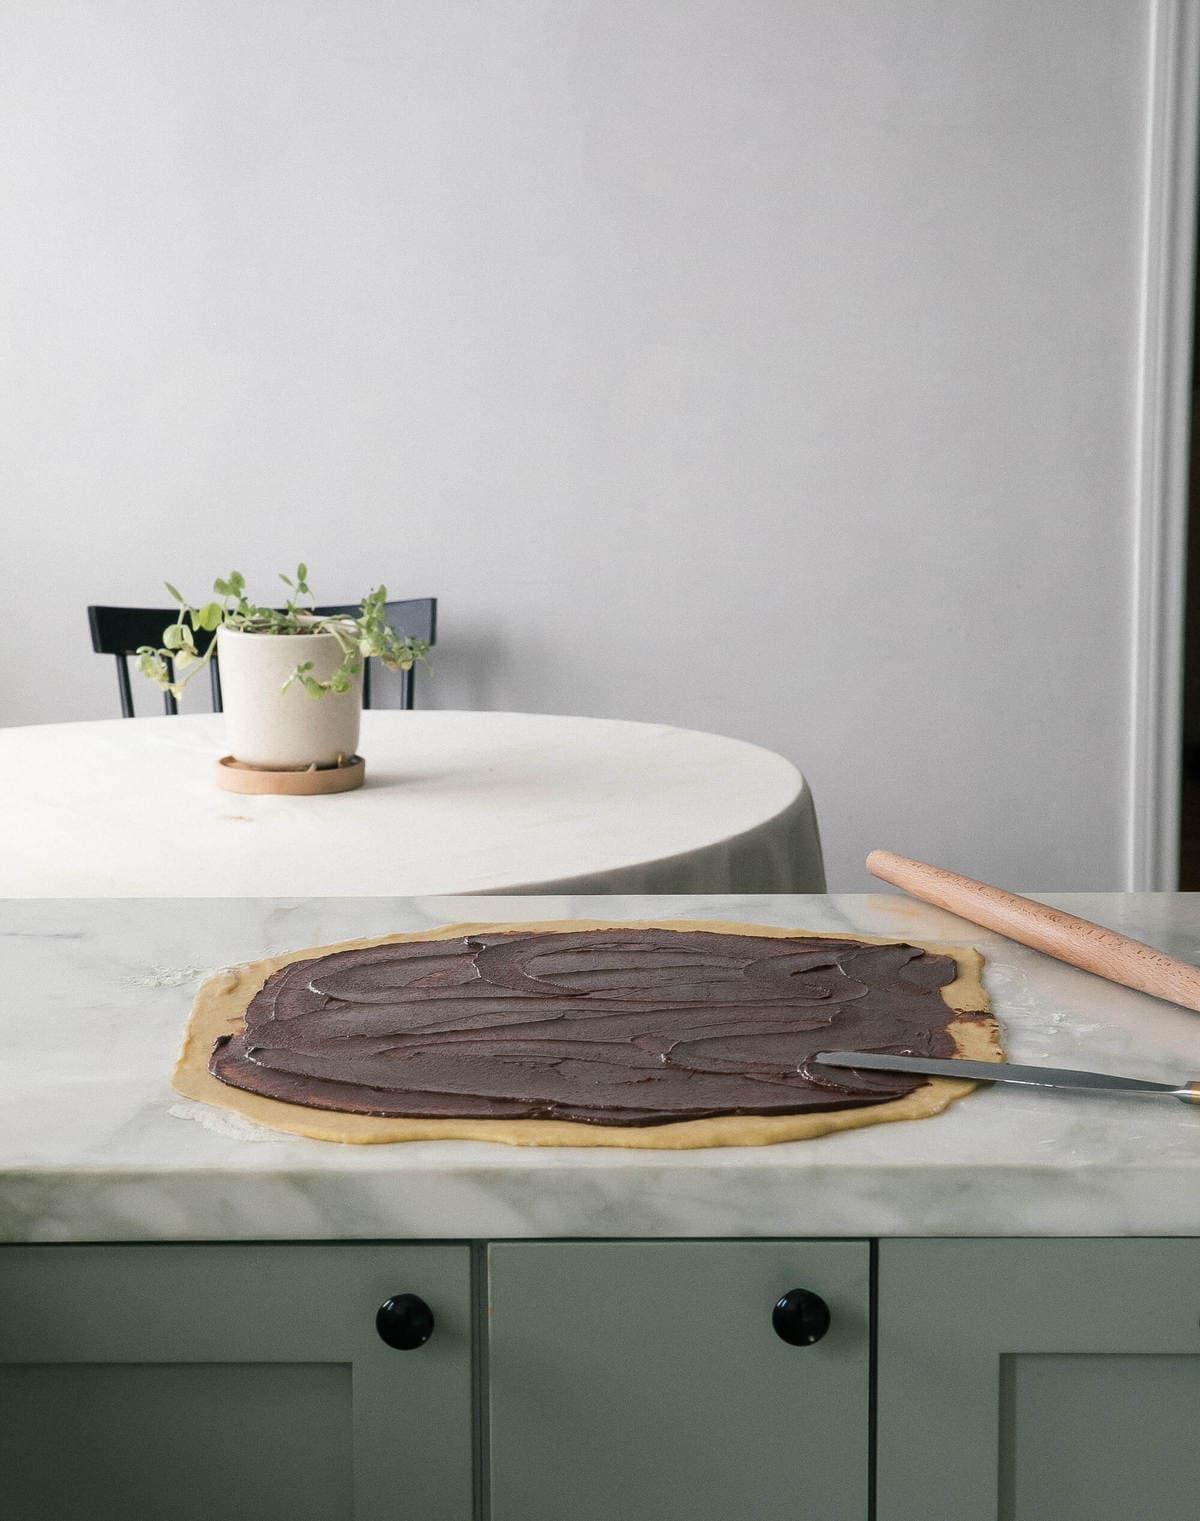 Chocolate Cardamom Morning Rolls